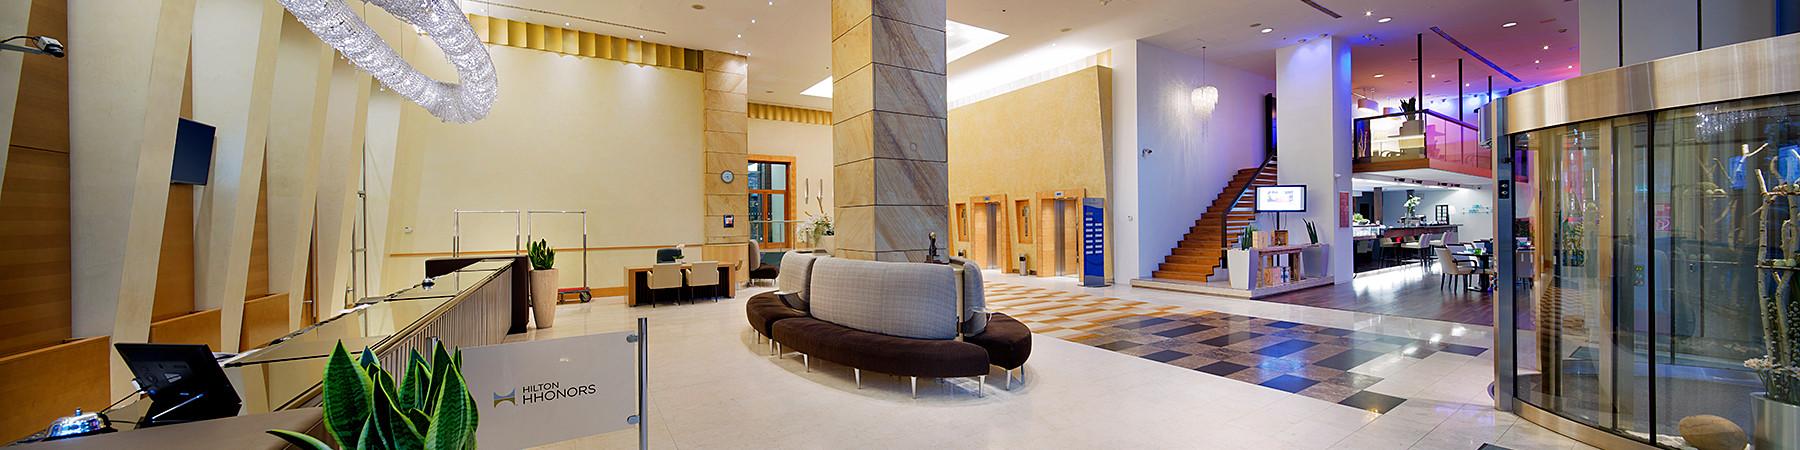 Hilton Budapest City - Lobby © Hilton Budapest City